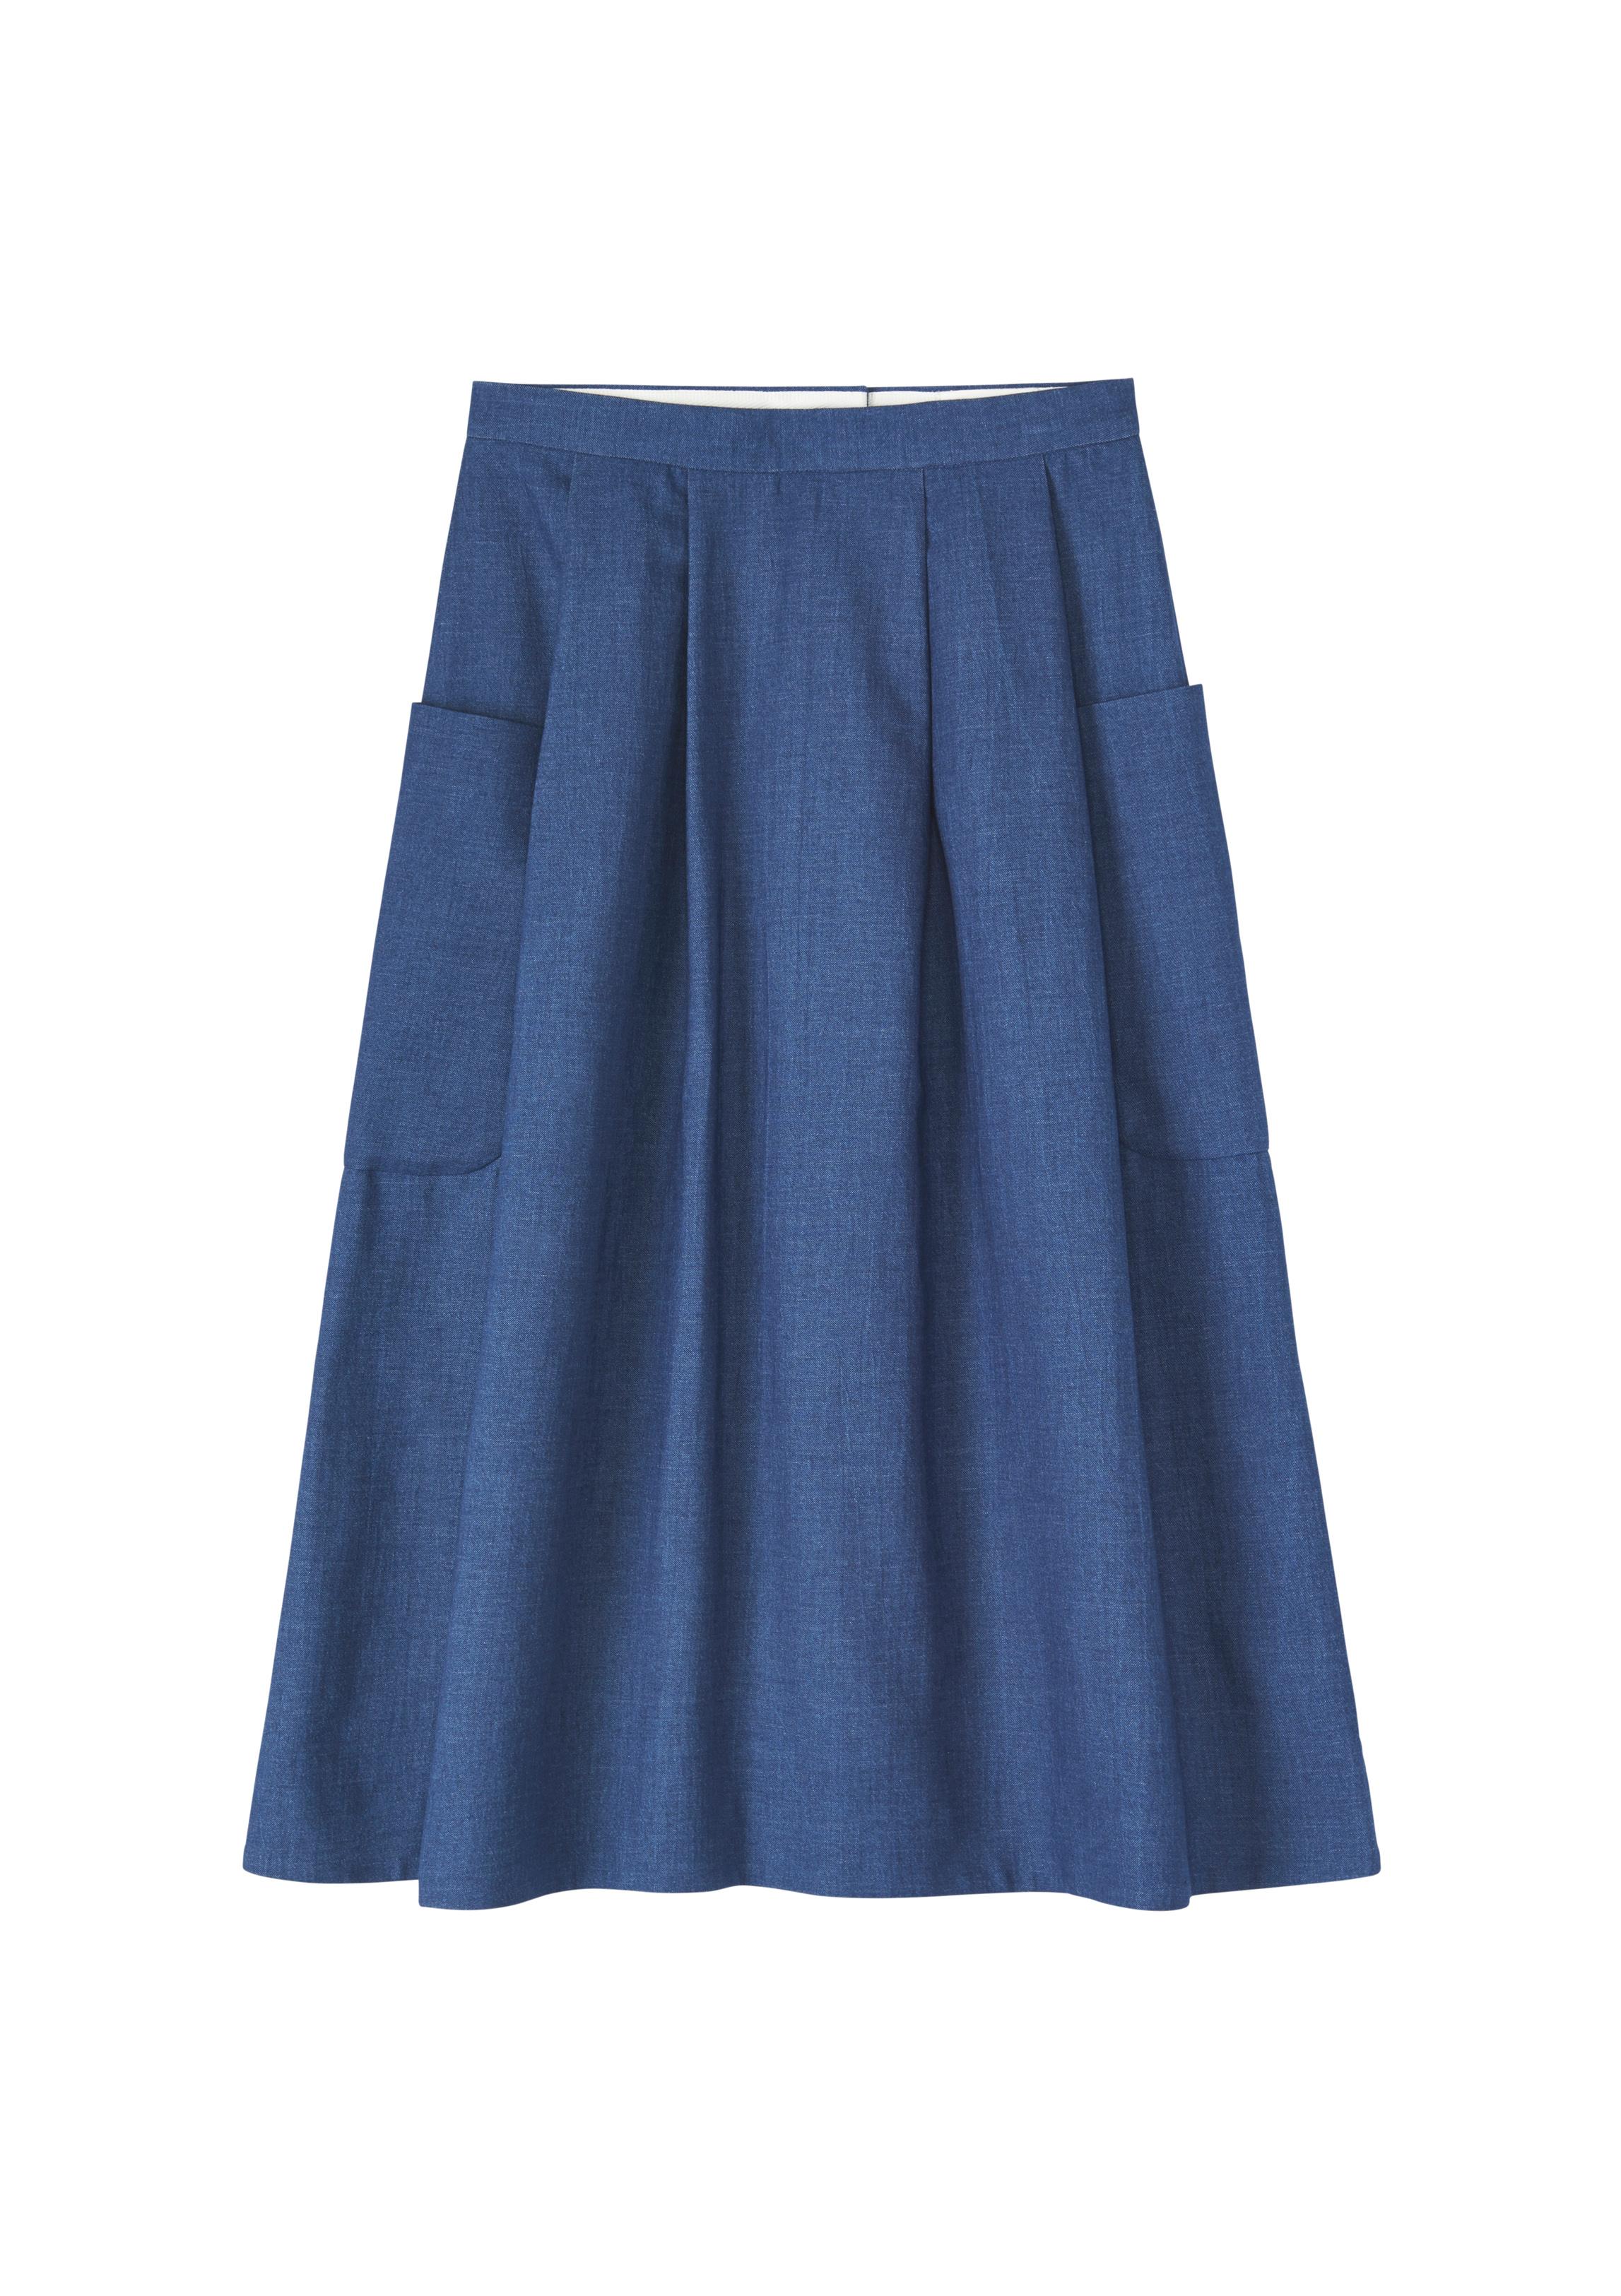 Akira midi skirt, £125, Toast